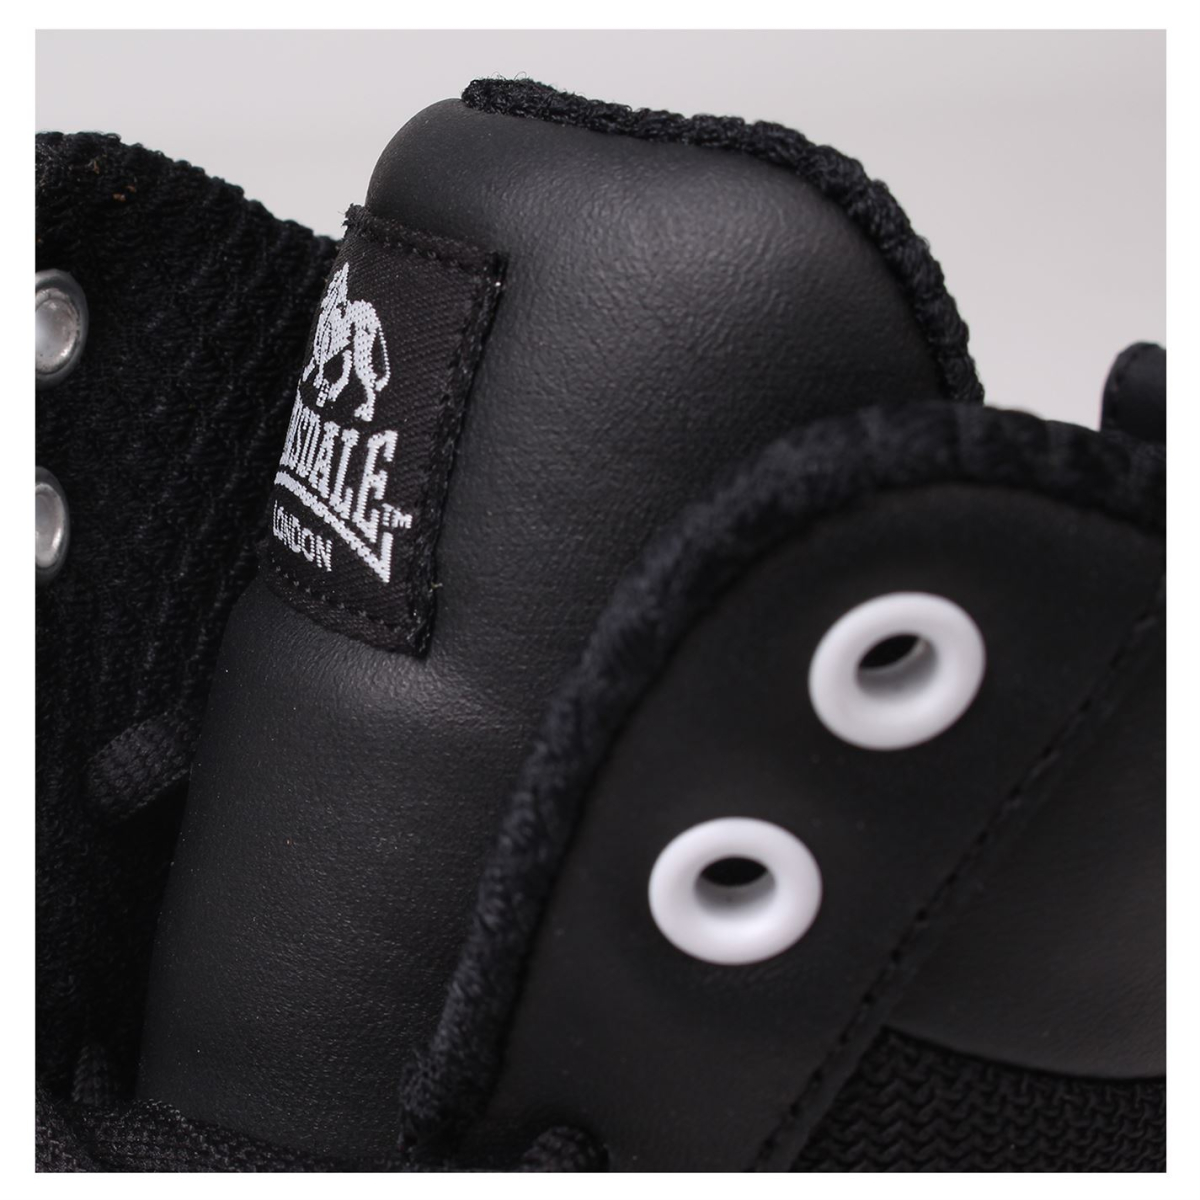 Lonsdale Jungen Boxschuhe Boxen Stiefel Turnschuhe Boxing Schuhe Contender 079